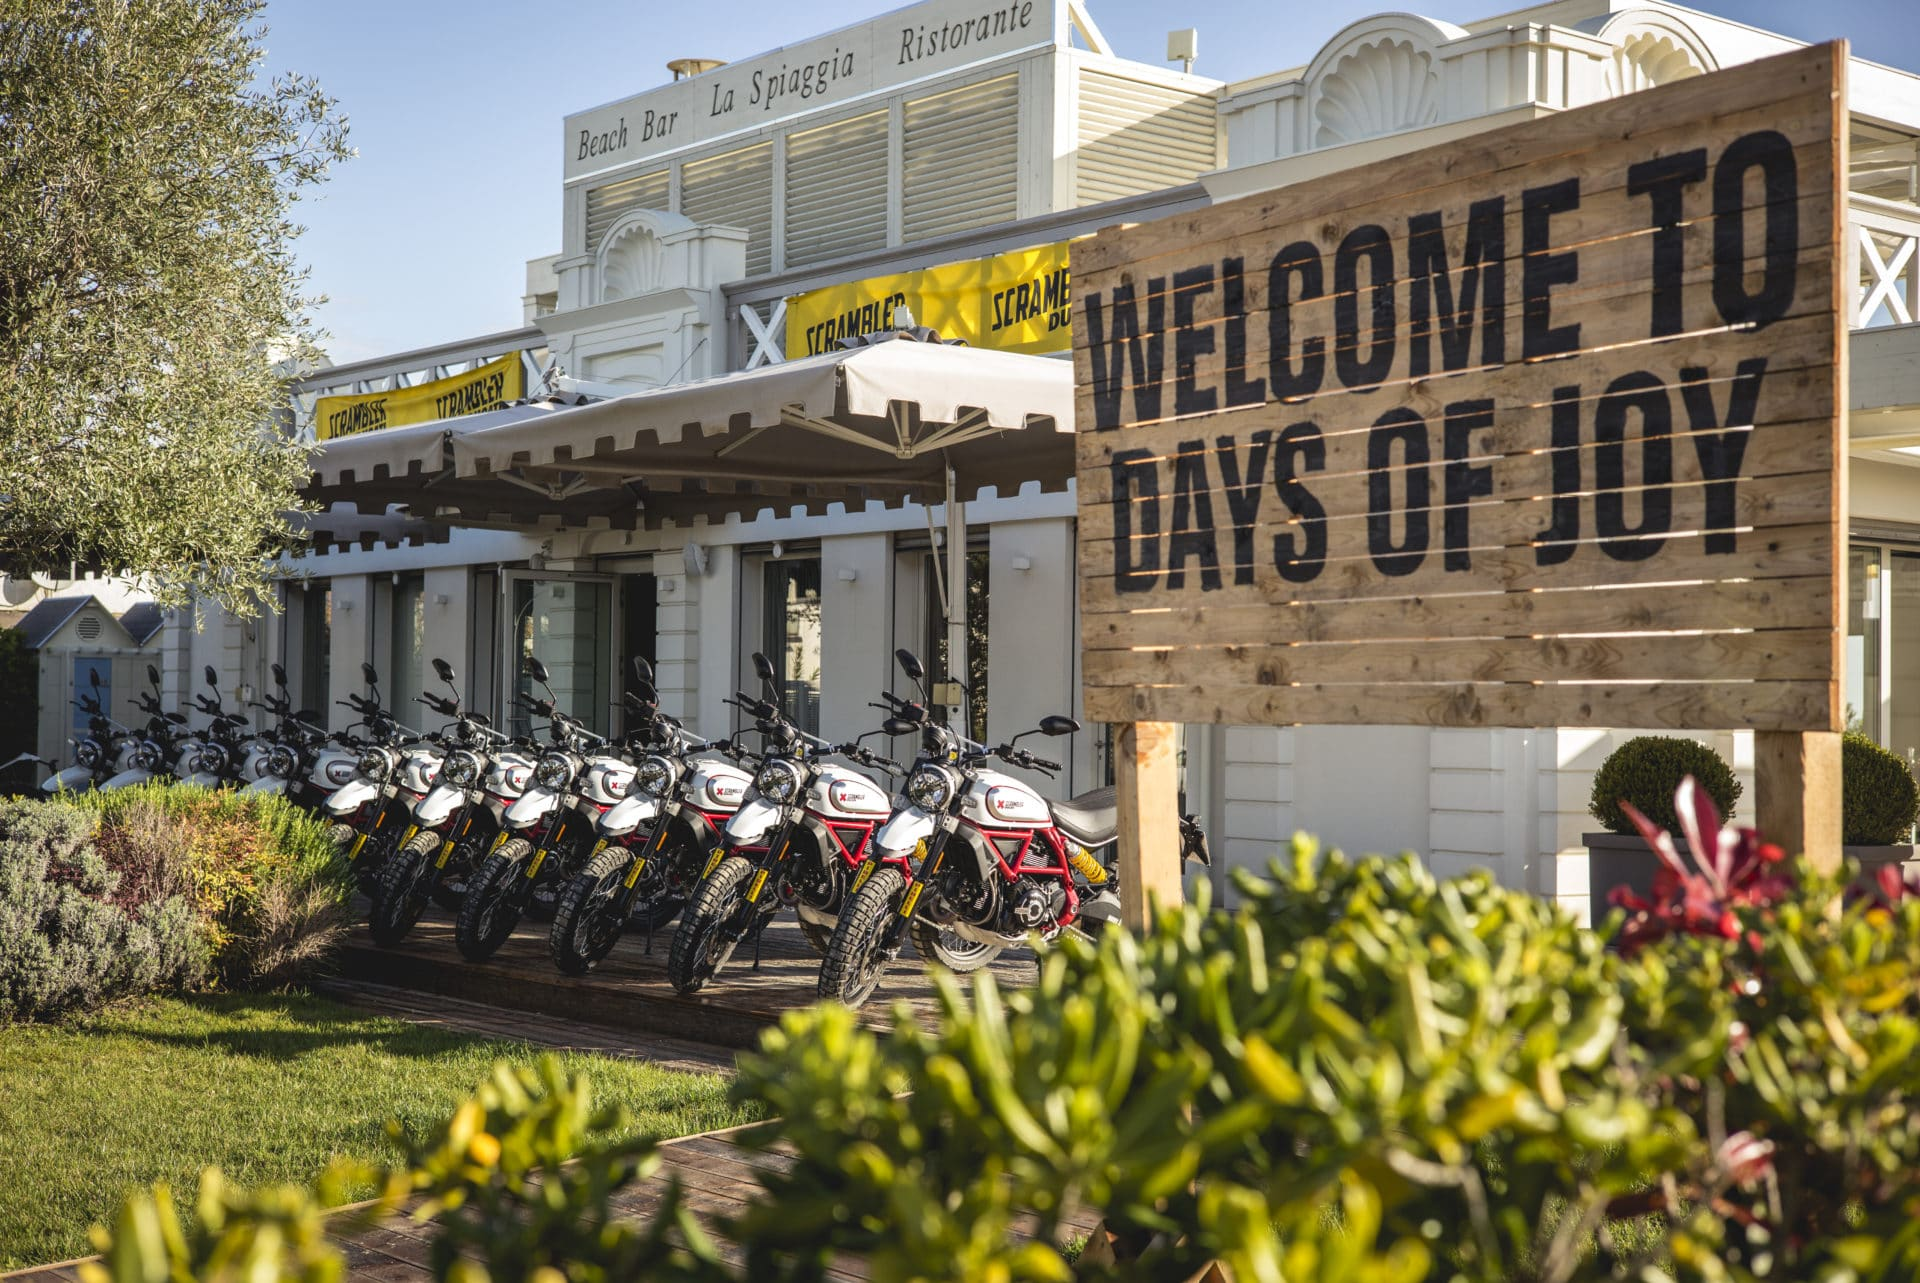 Ducati Scrambler - Days of Joy